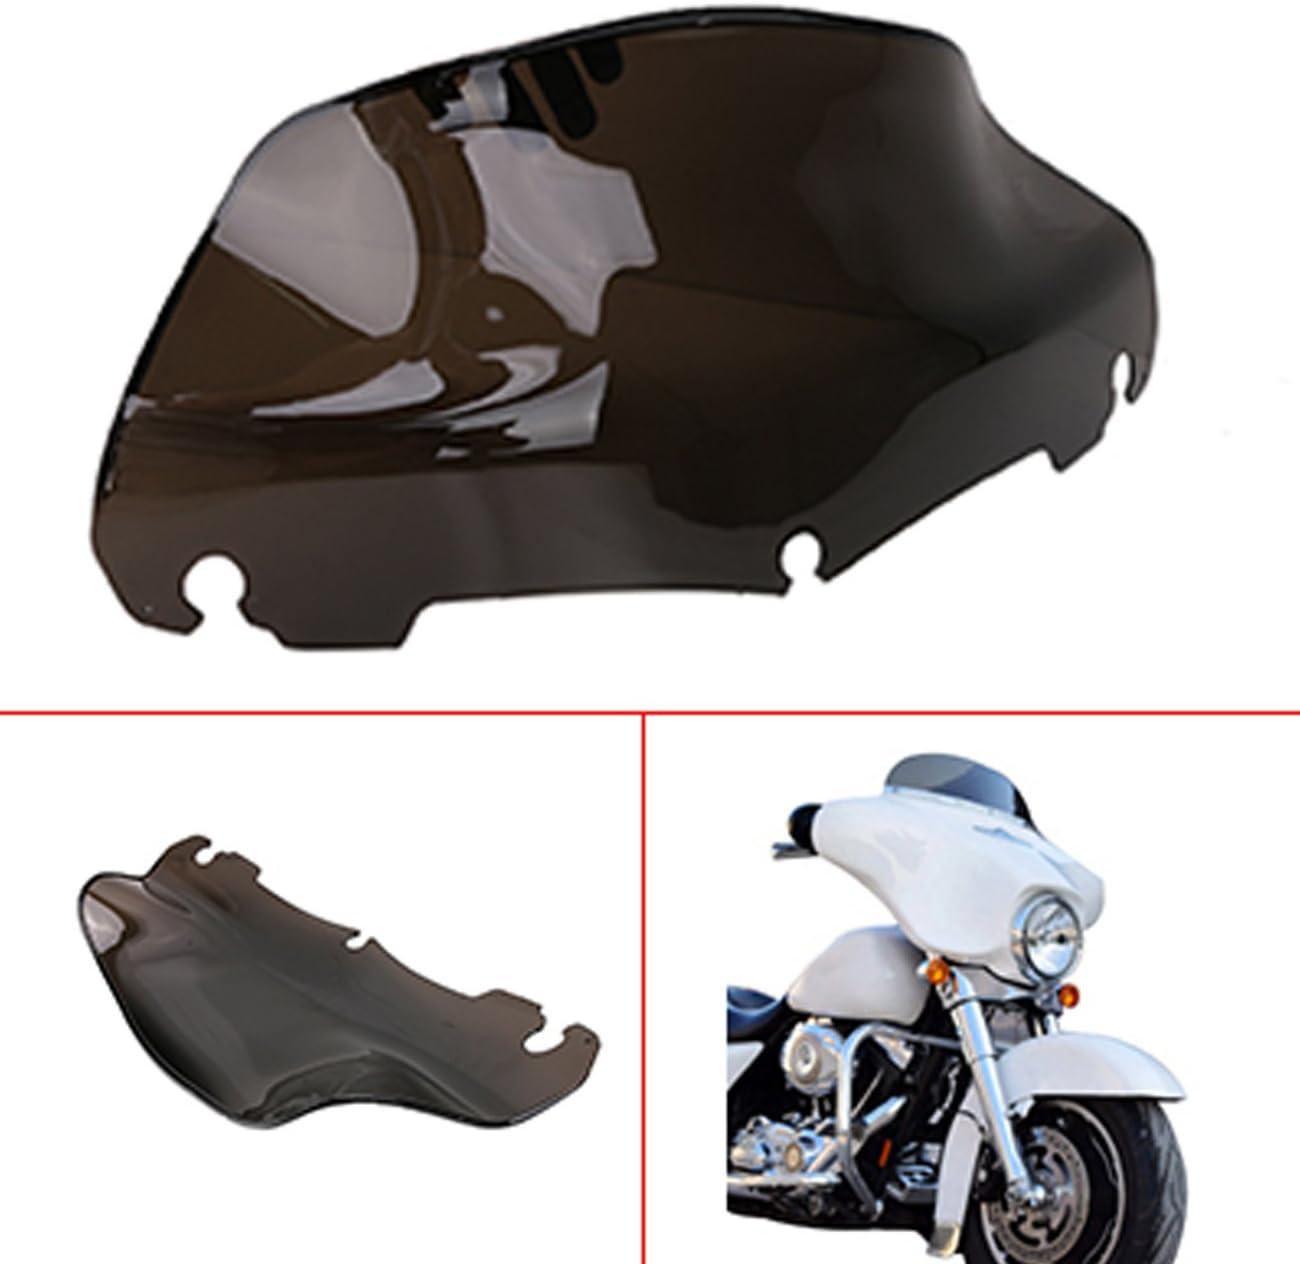 buyinhouse Fit for 2014-2019 Harley Davidson Touring,Electra Glide,Street Glide,Ultra Limited /& Tri-Glide Ultra Motorcycle Chrome Tri-Line Gauge Trim